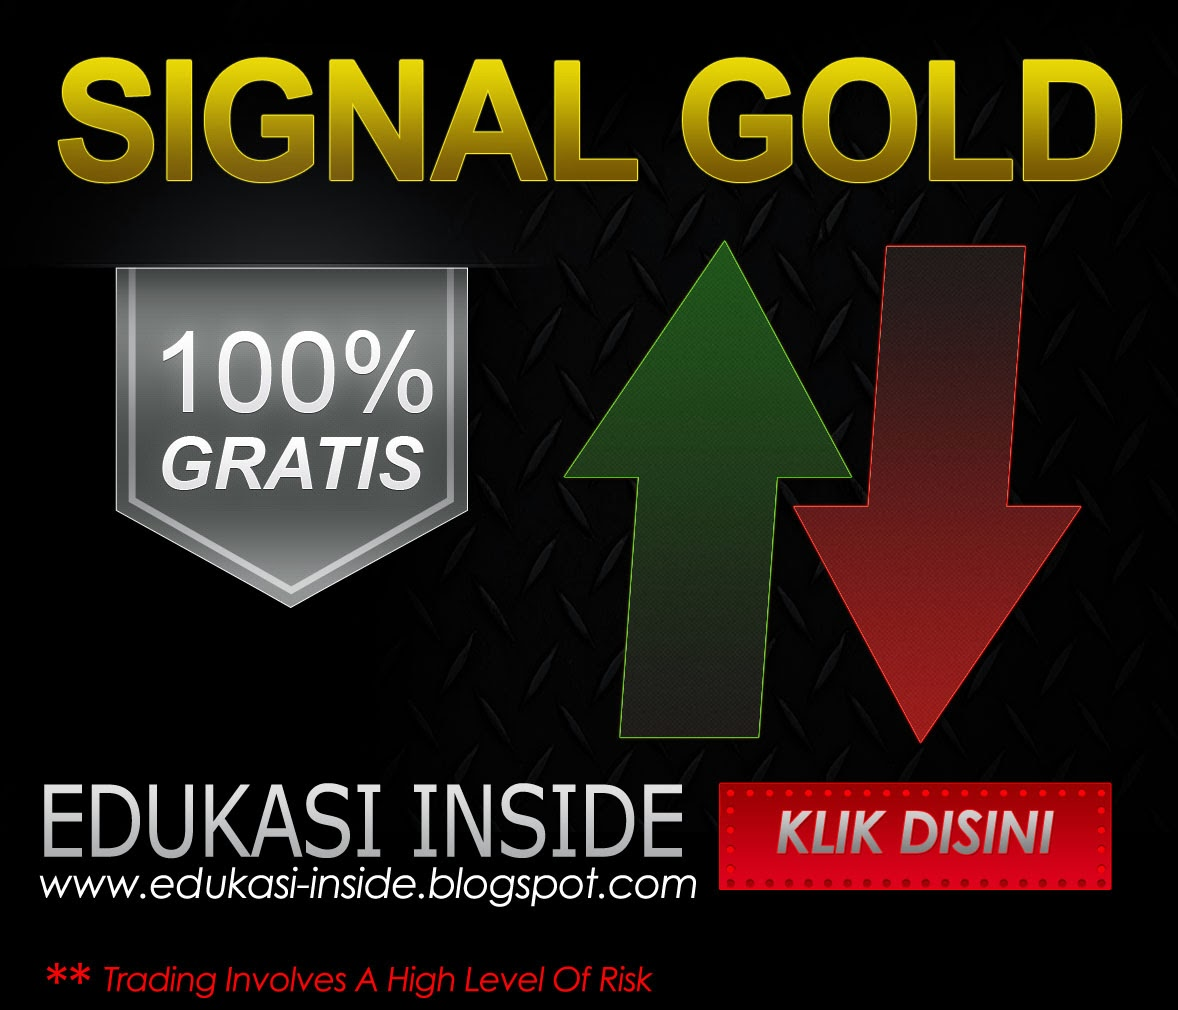 SIGNAL GOLD